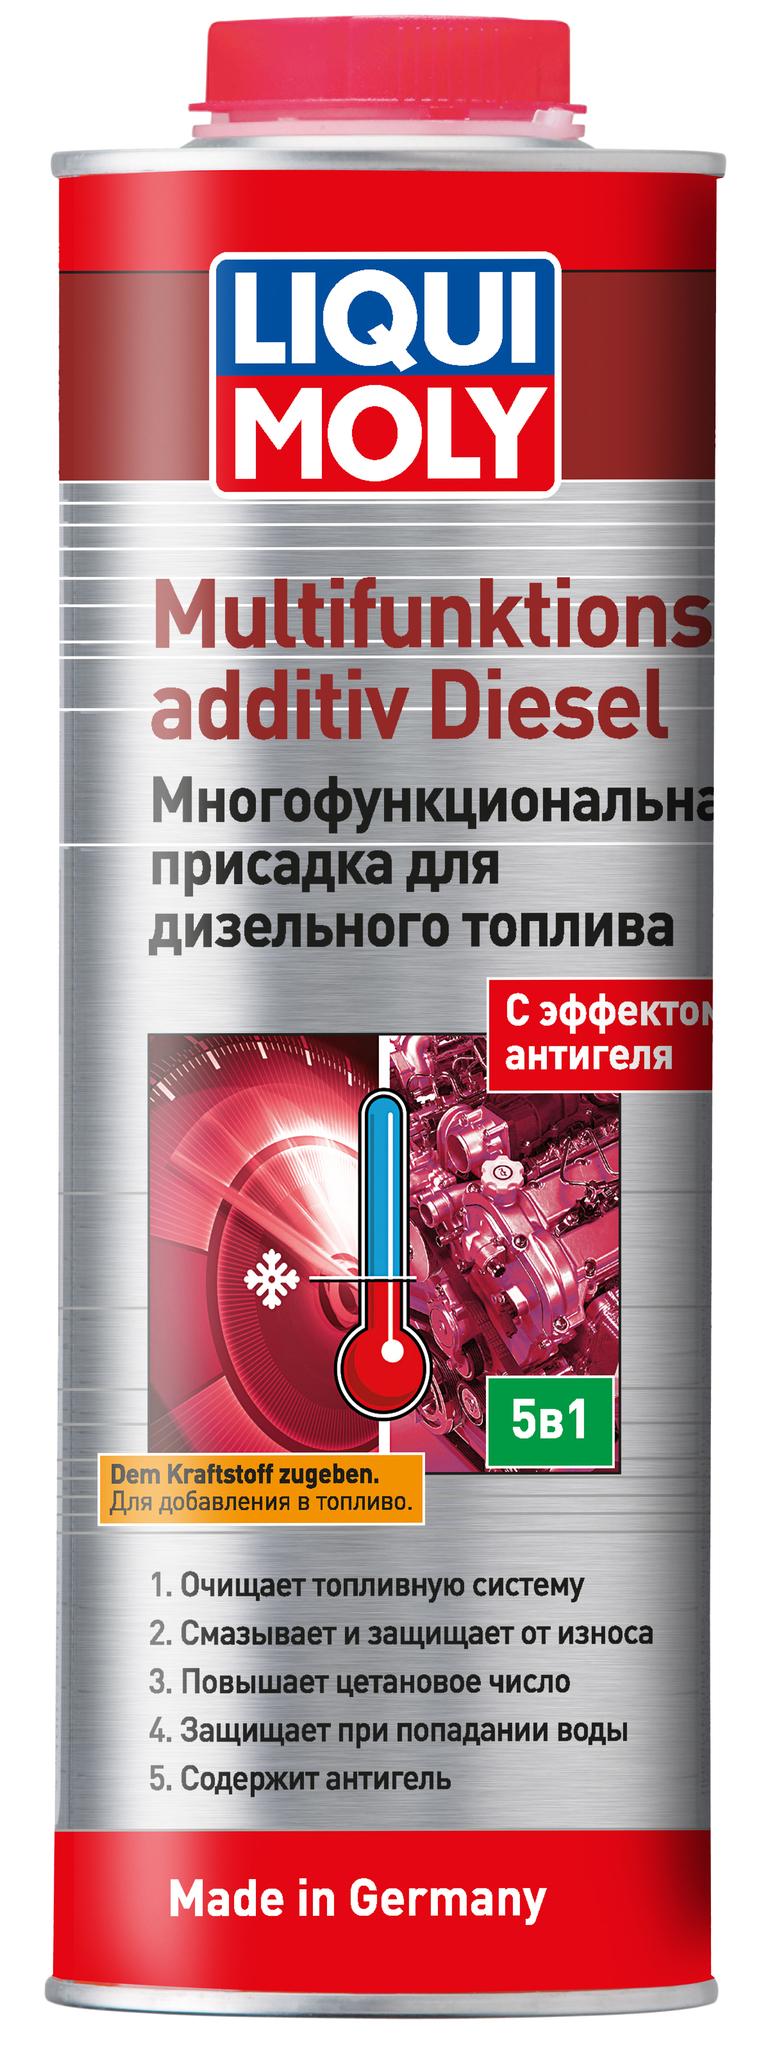 Liqui Moly Multifunktionsadditiv Diesel Дизельная присадка